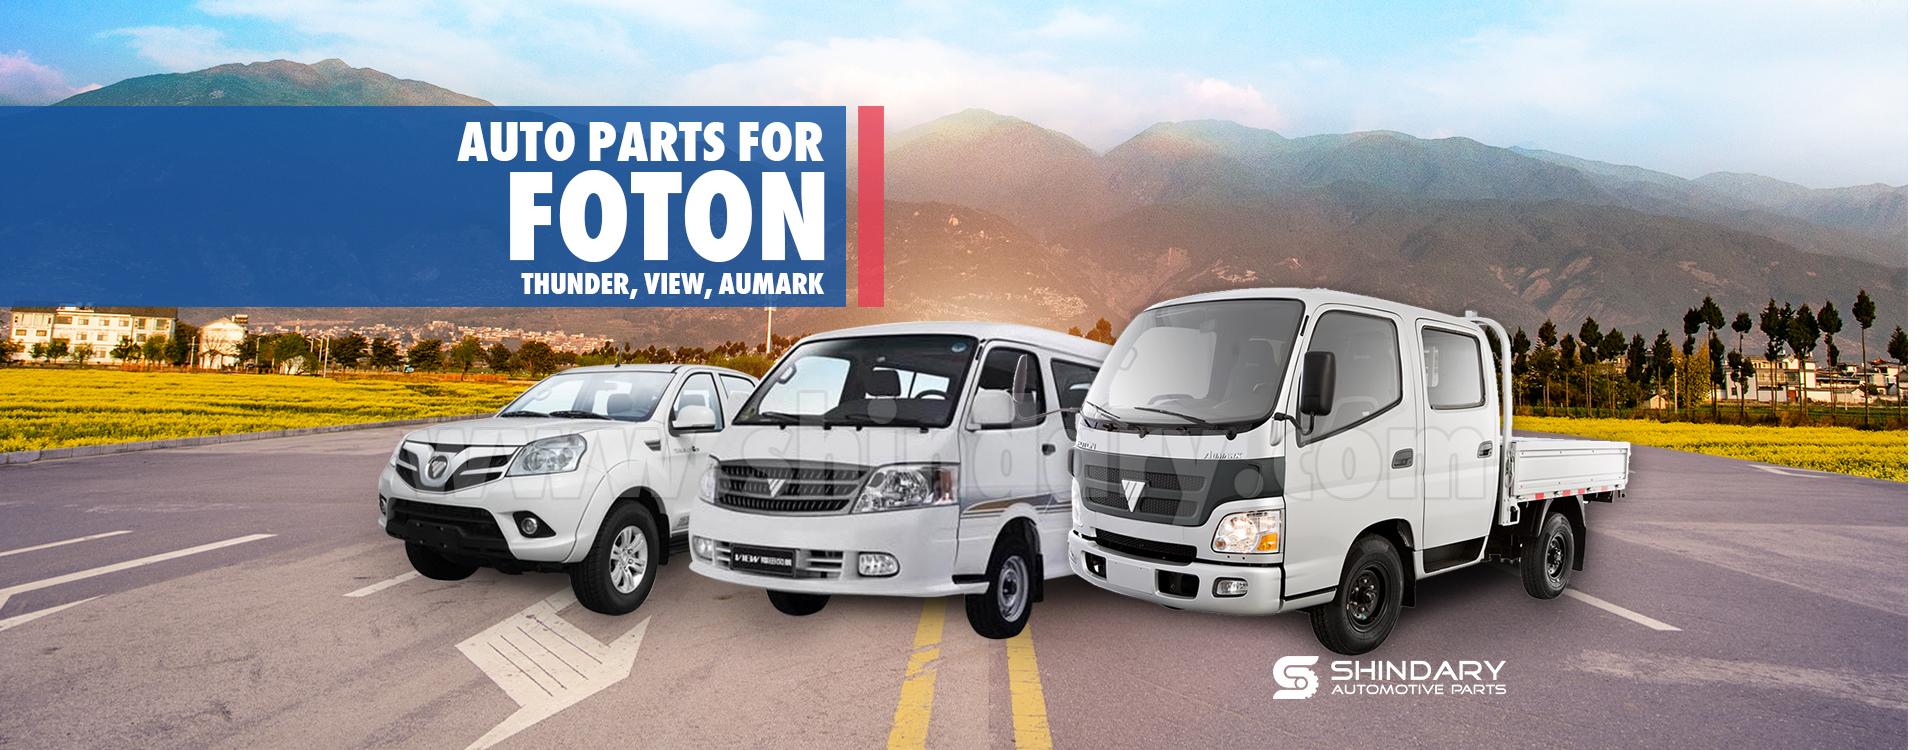 Automotive parts for FOTON Thunder, View, Aumark. Shindary auto parts